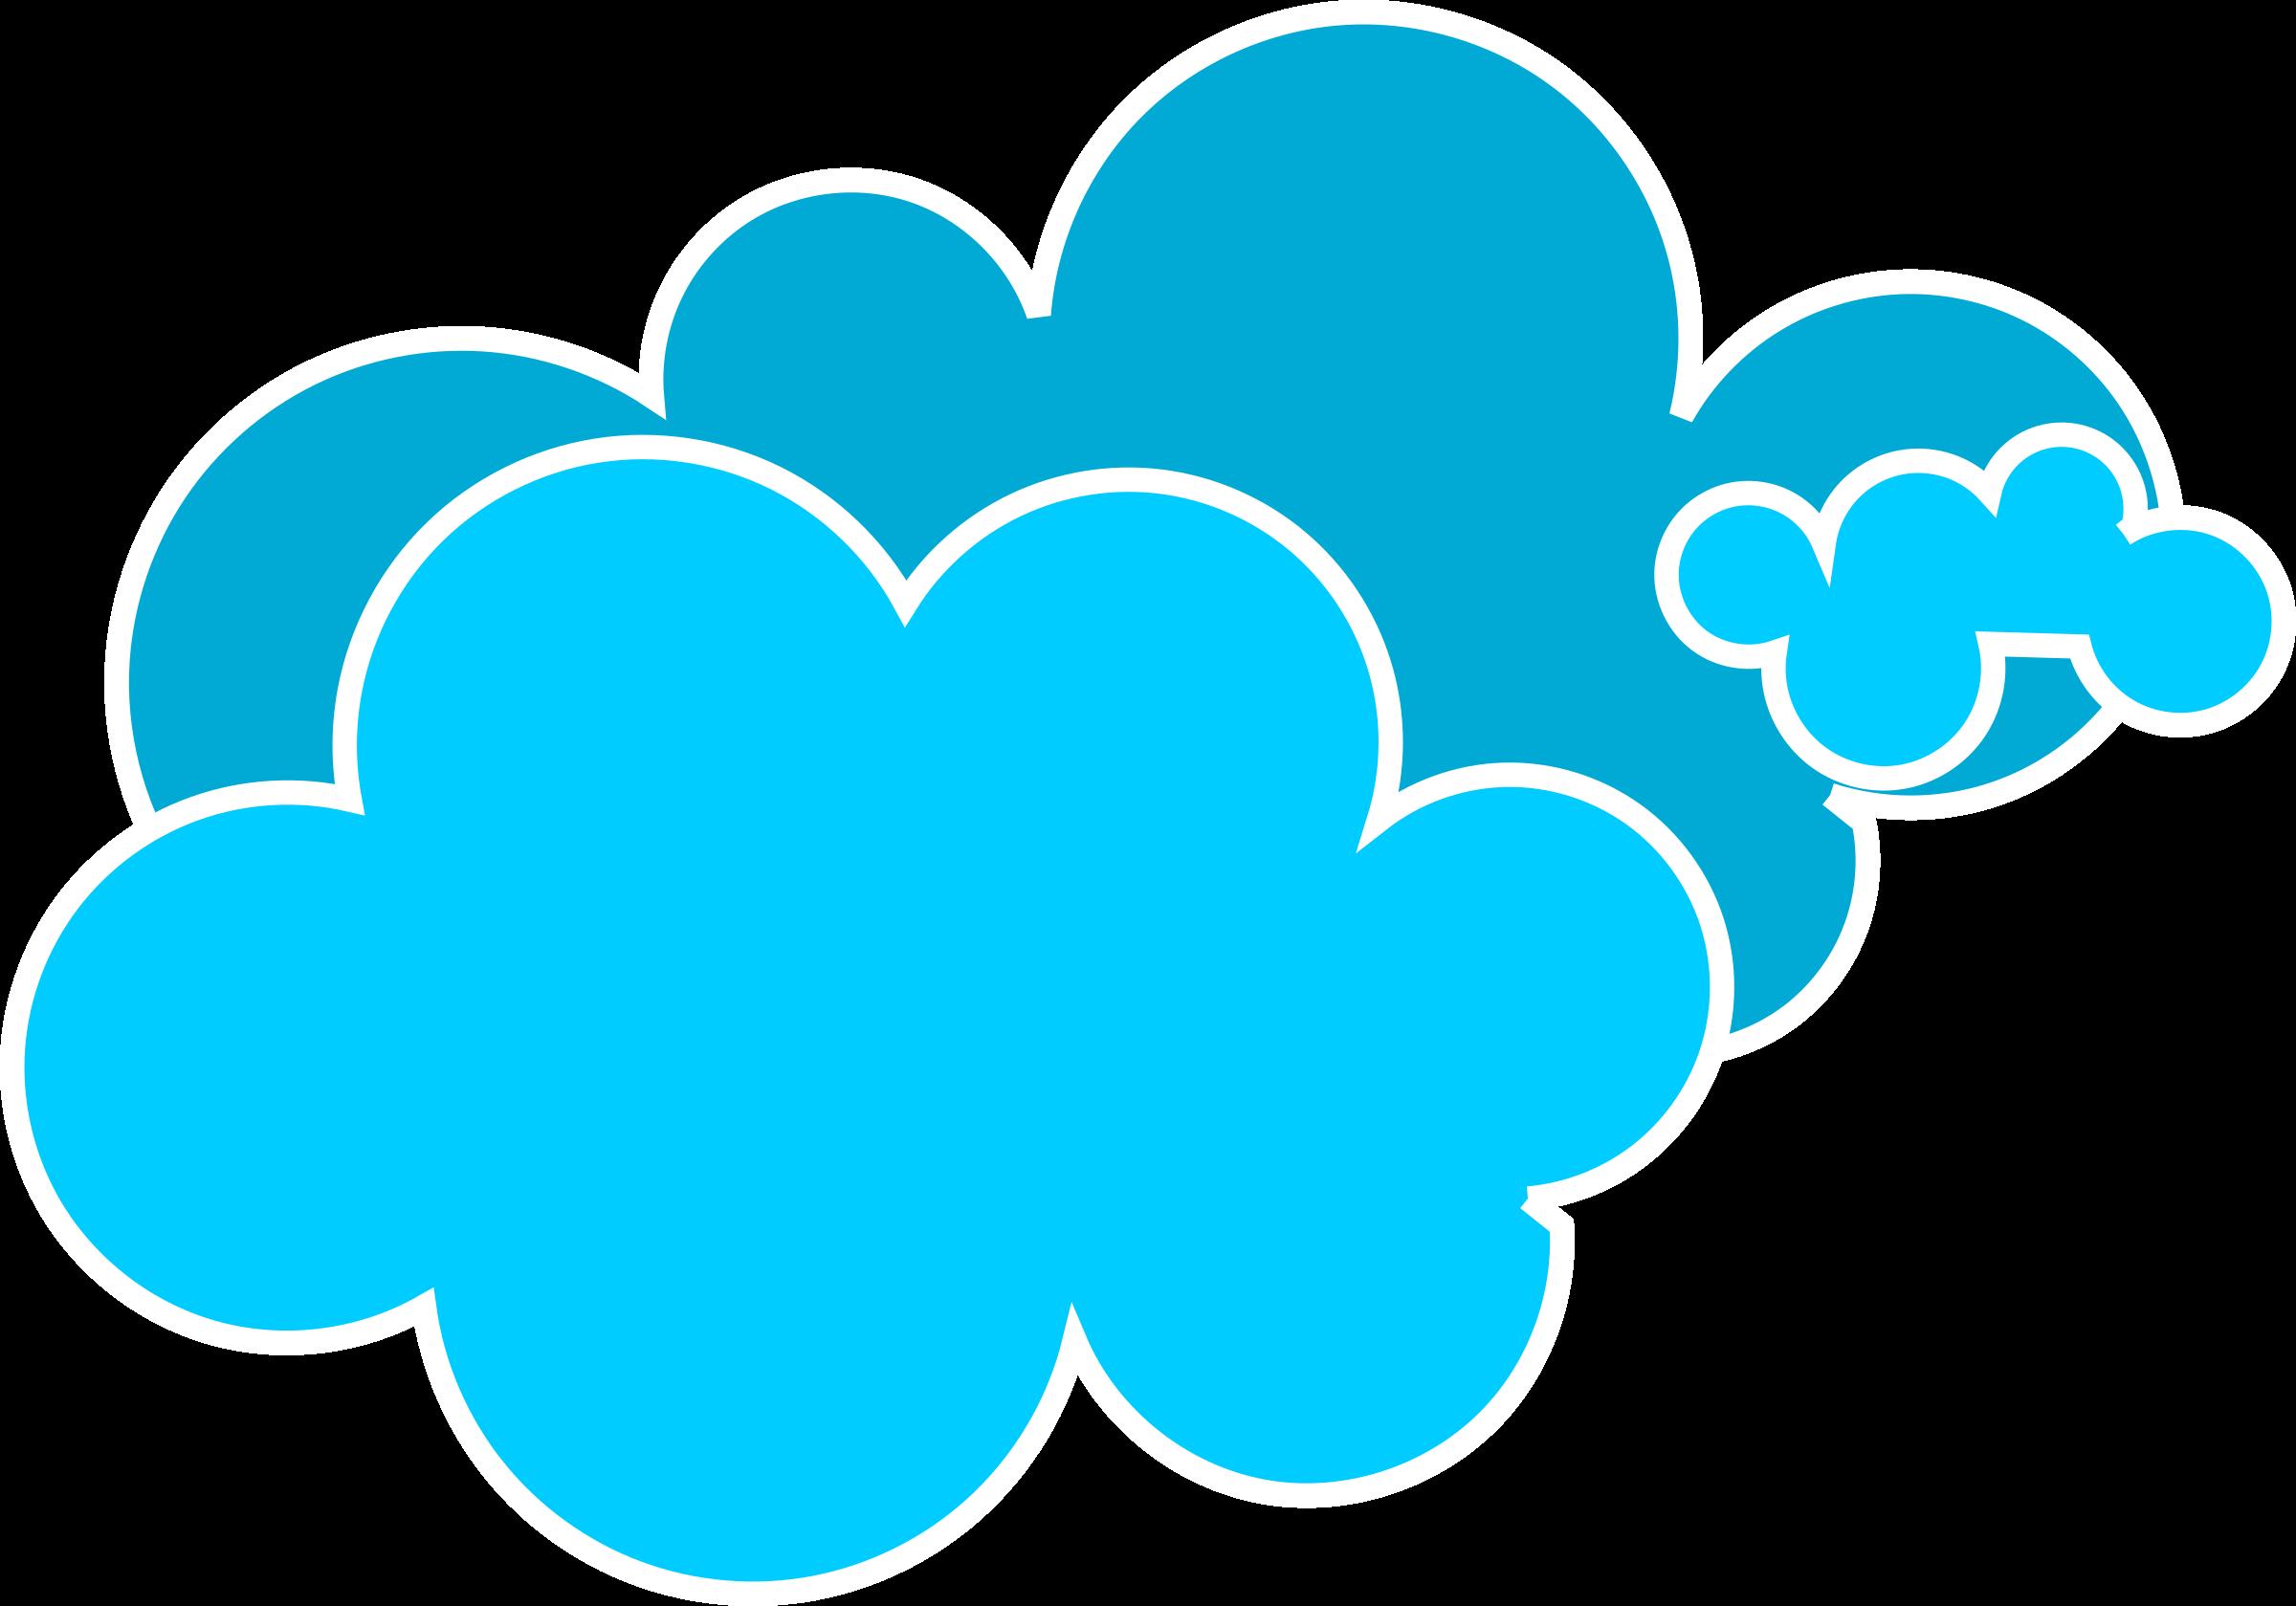 Blue Cloud Clipart Cupcake.